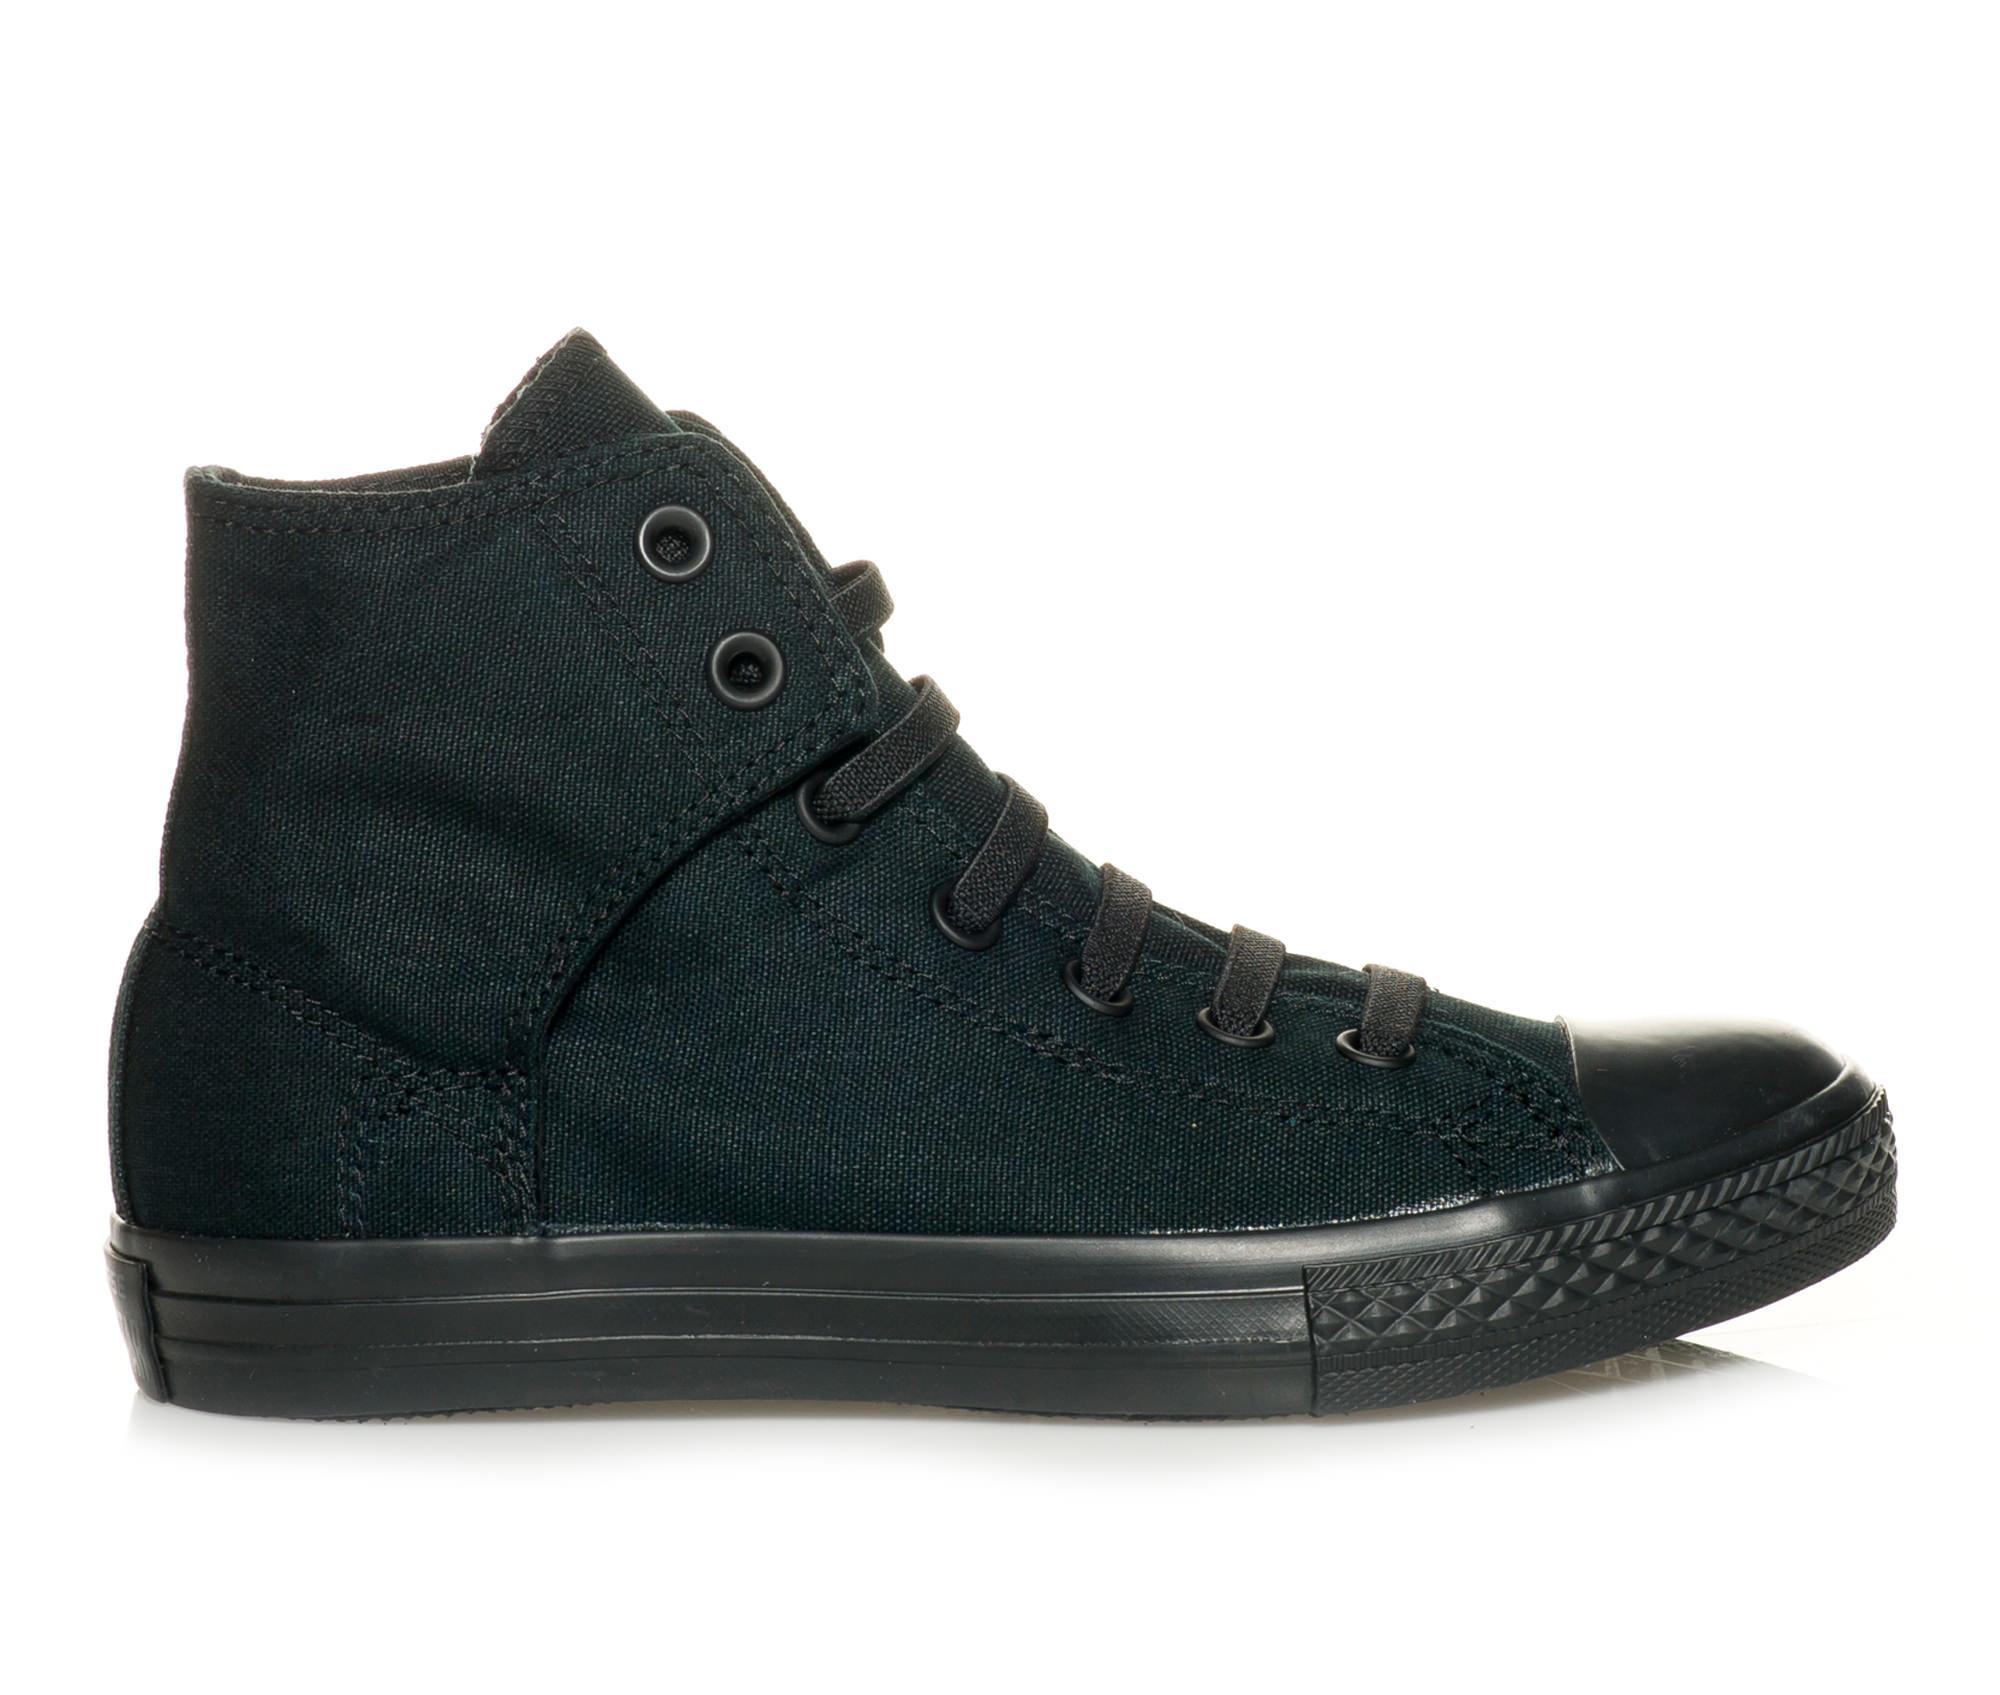 Boys' Converse Chuck Taylor All Star Easy Slip Hi Sneakers (Black)